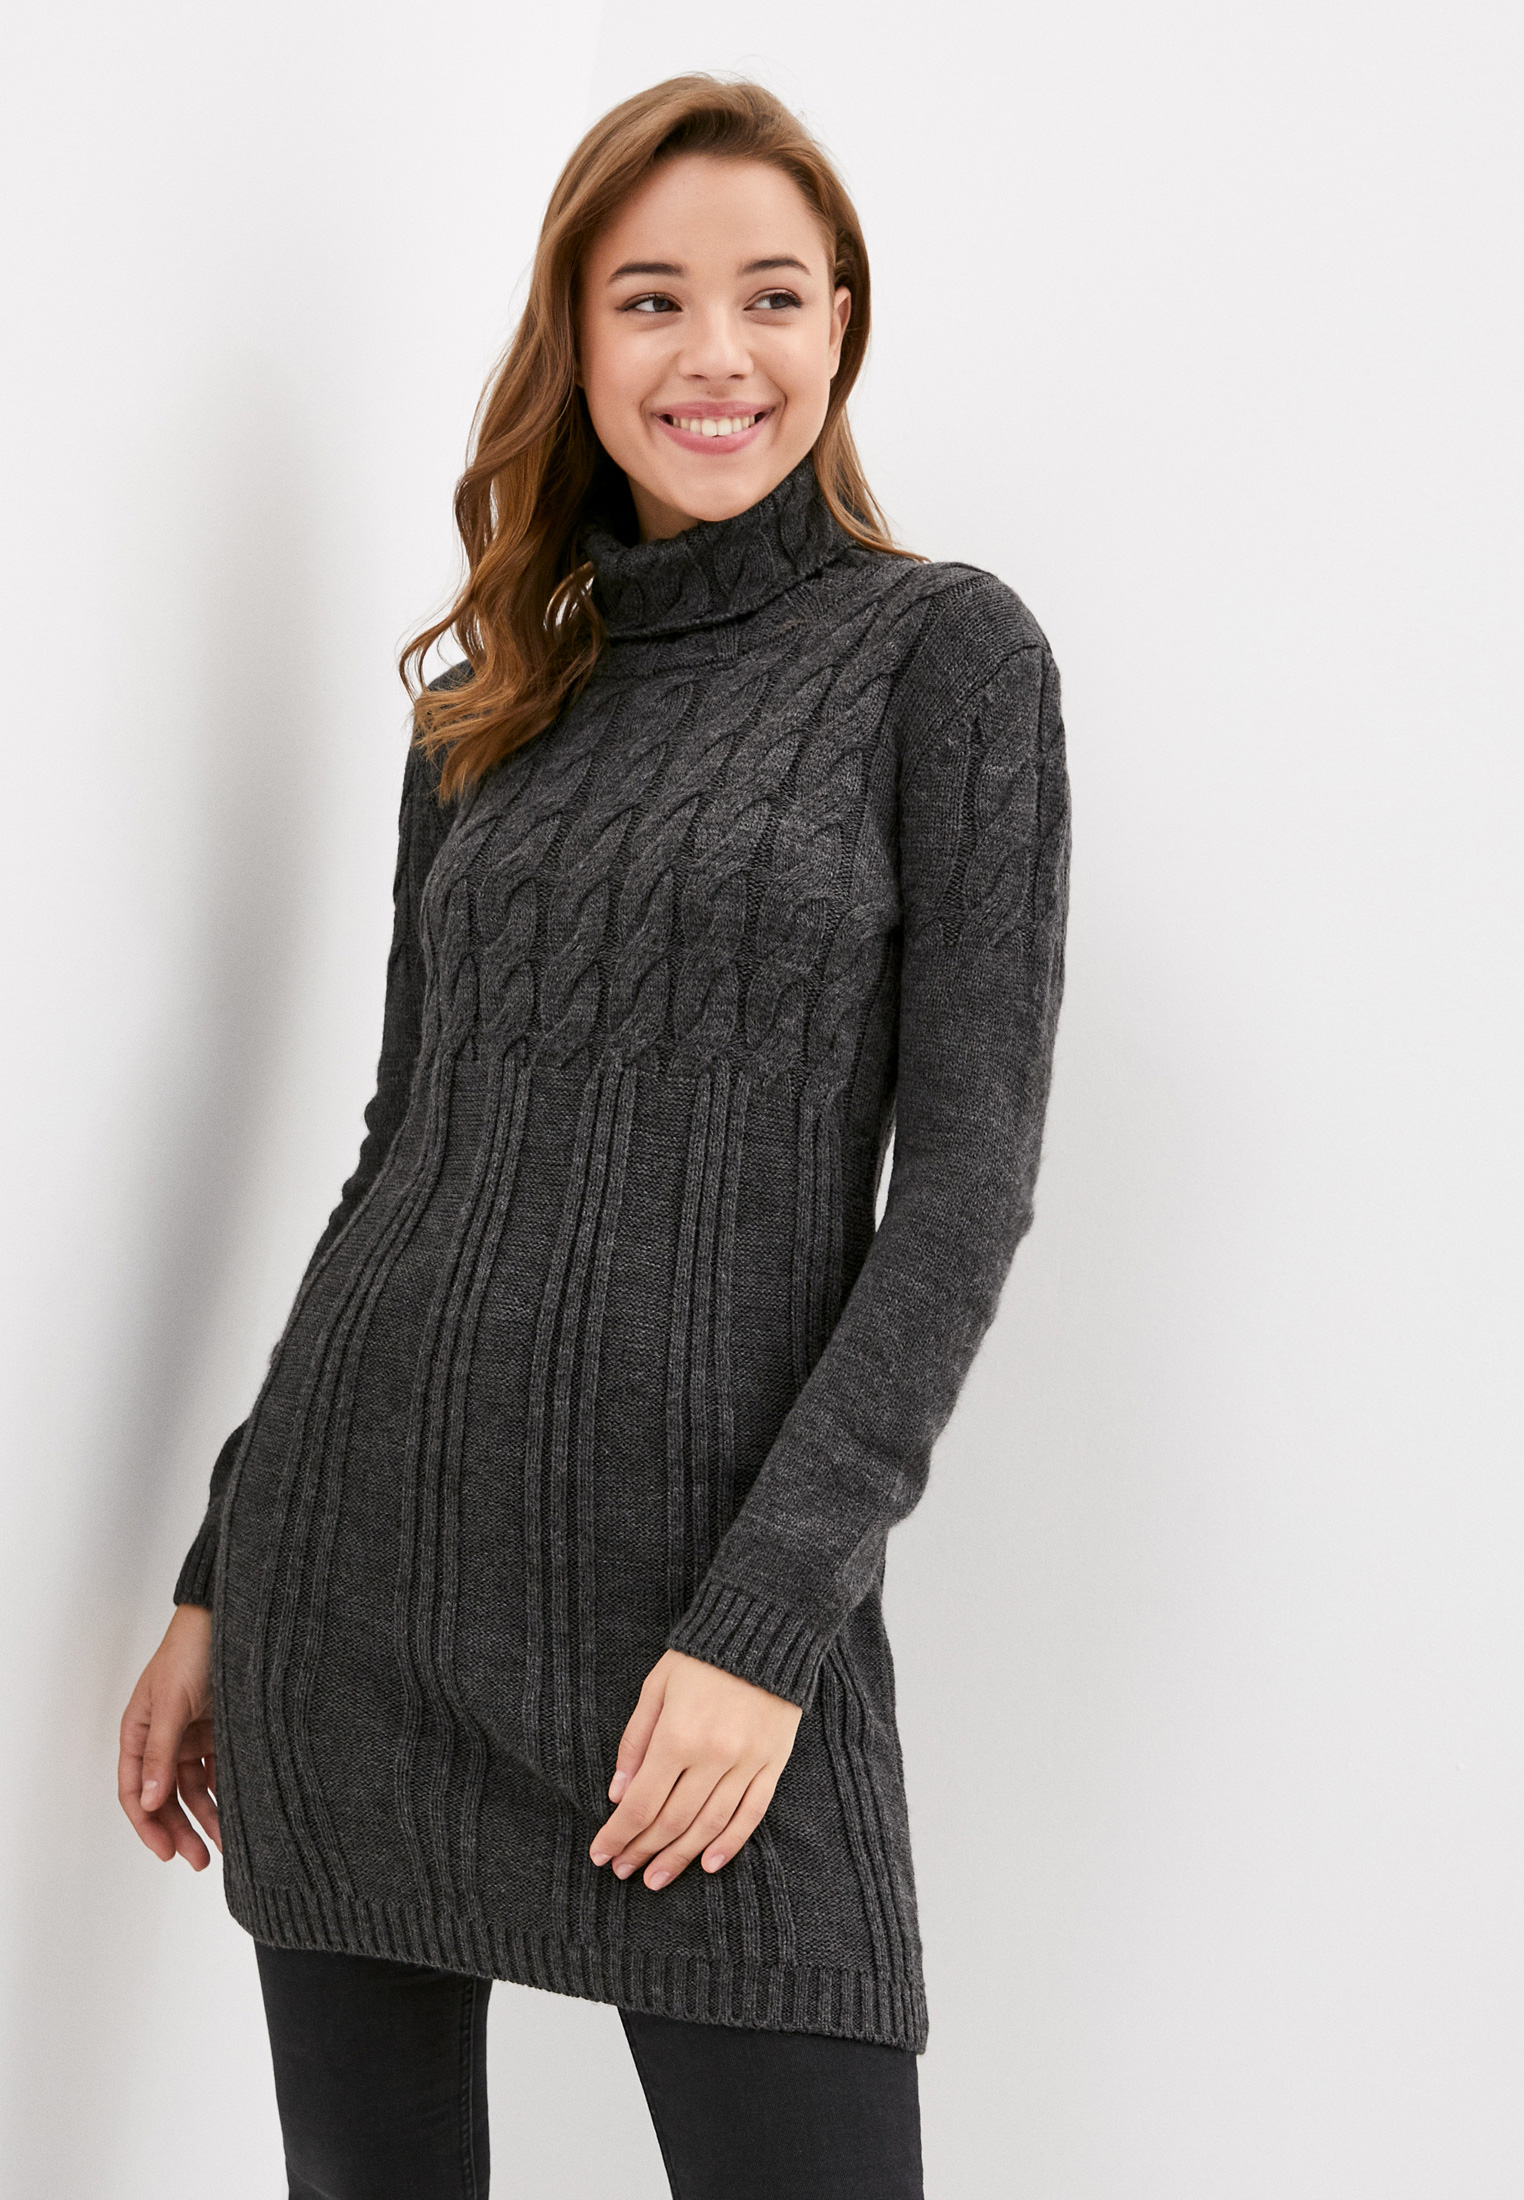 Вязаное платье JIMMY SANDERS (Джимми Сандерс) 19W KW6065 ANTHRACITE